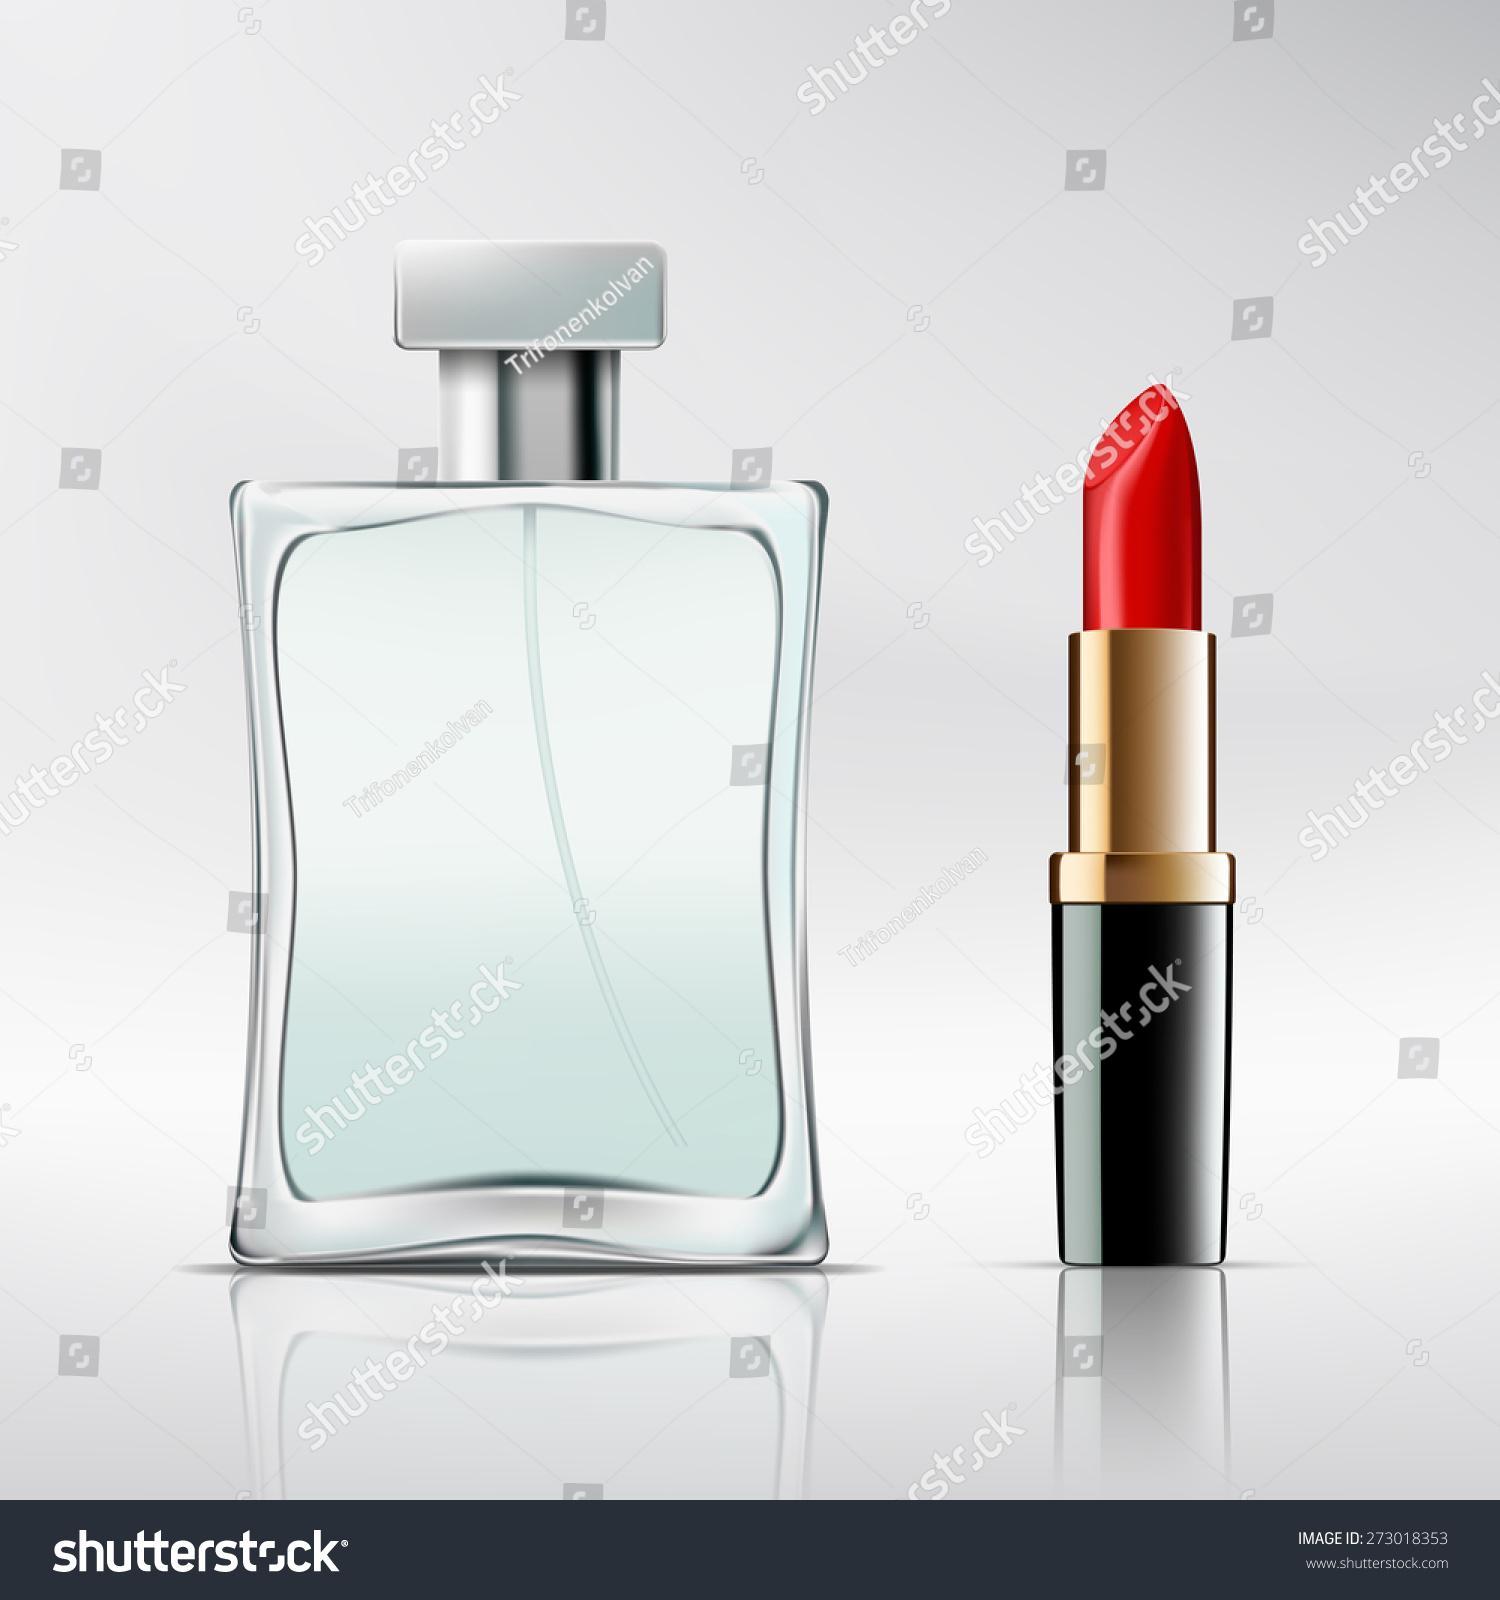 Bottle Perfume Lipstick Vector Image Stock Photo (Photo, Vector ...